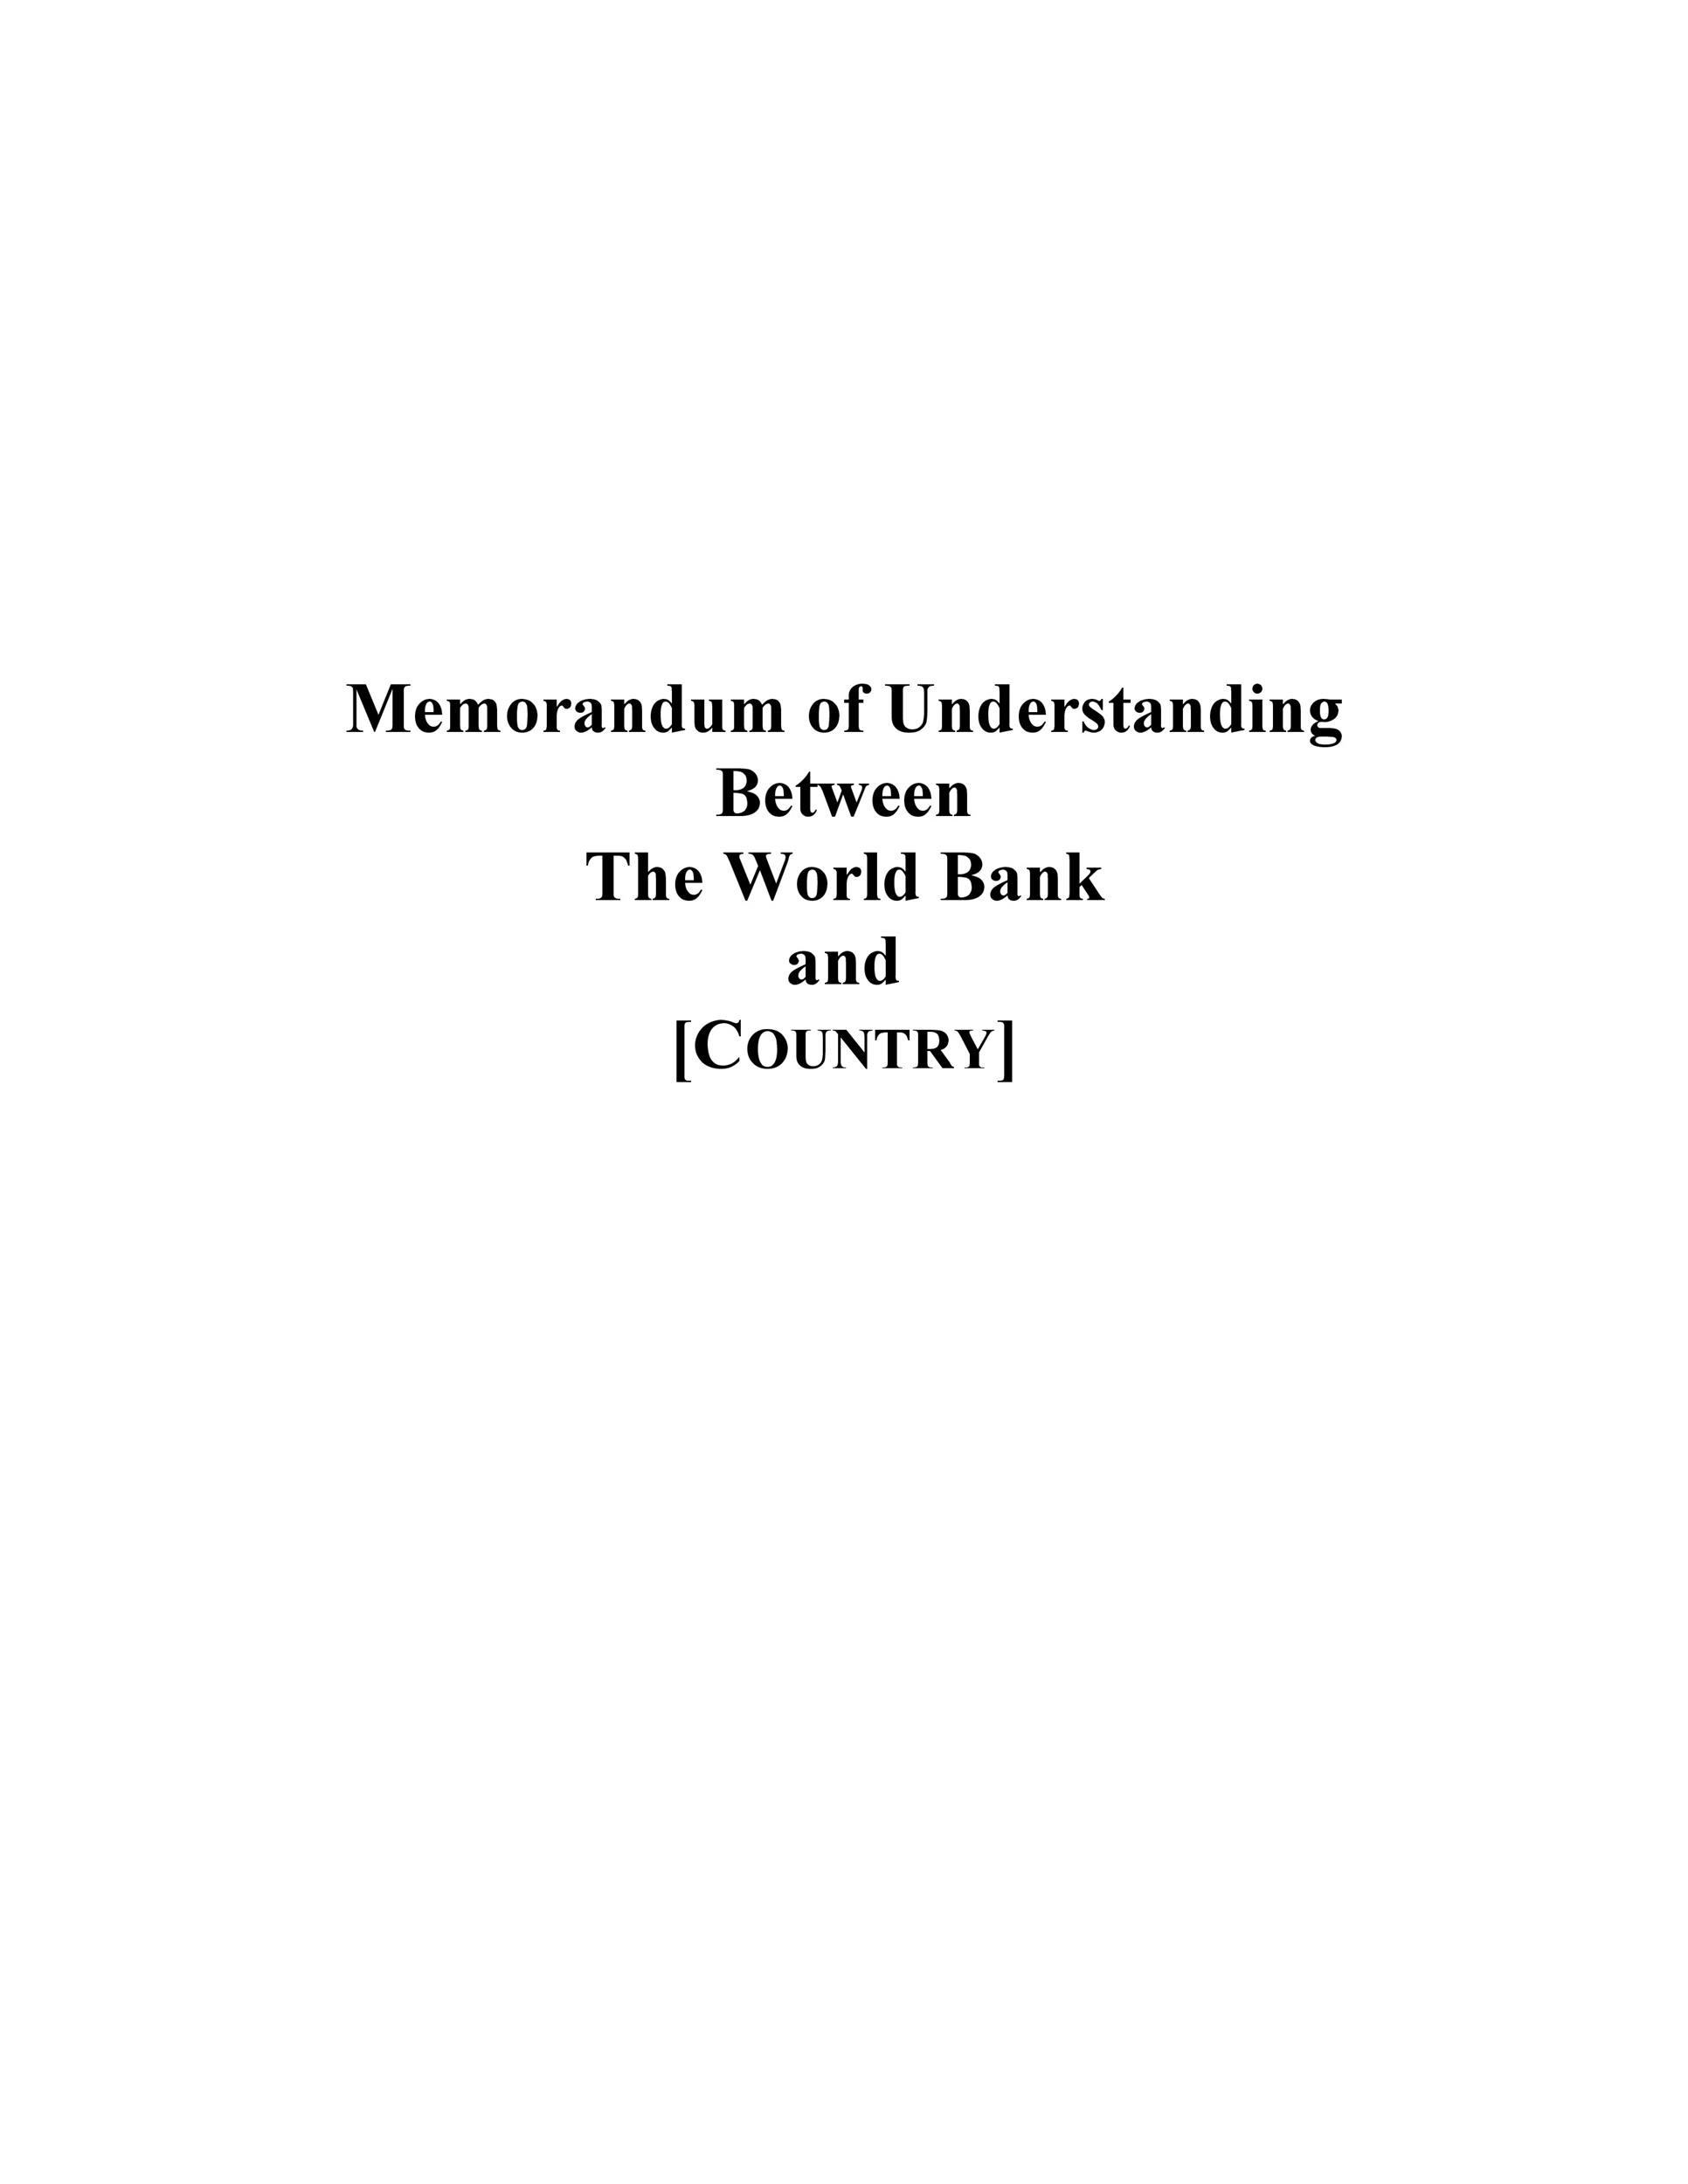 Free Memorandum of Understanding Template 28